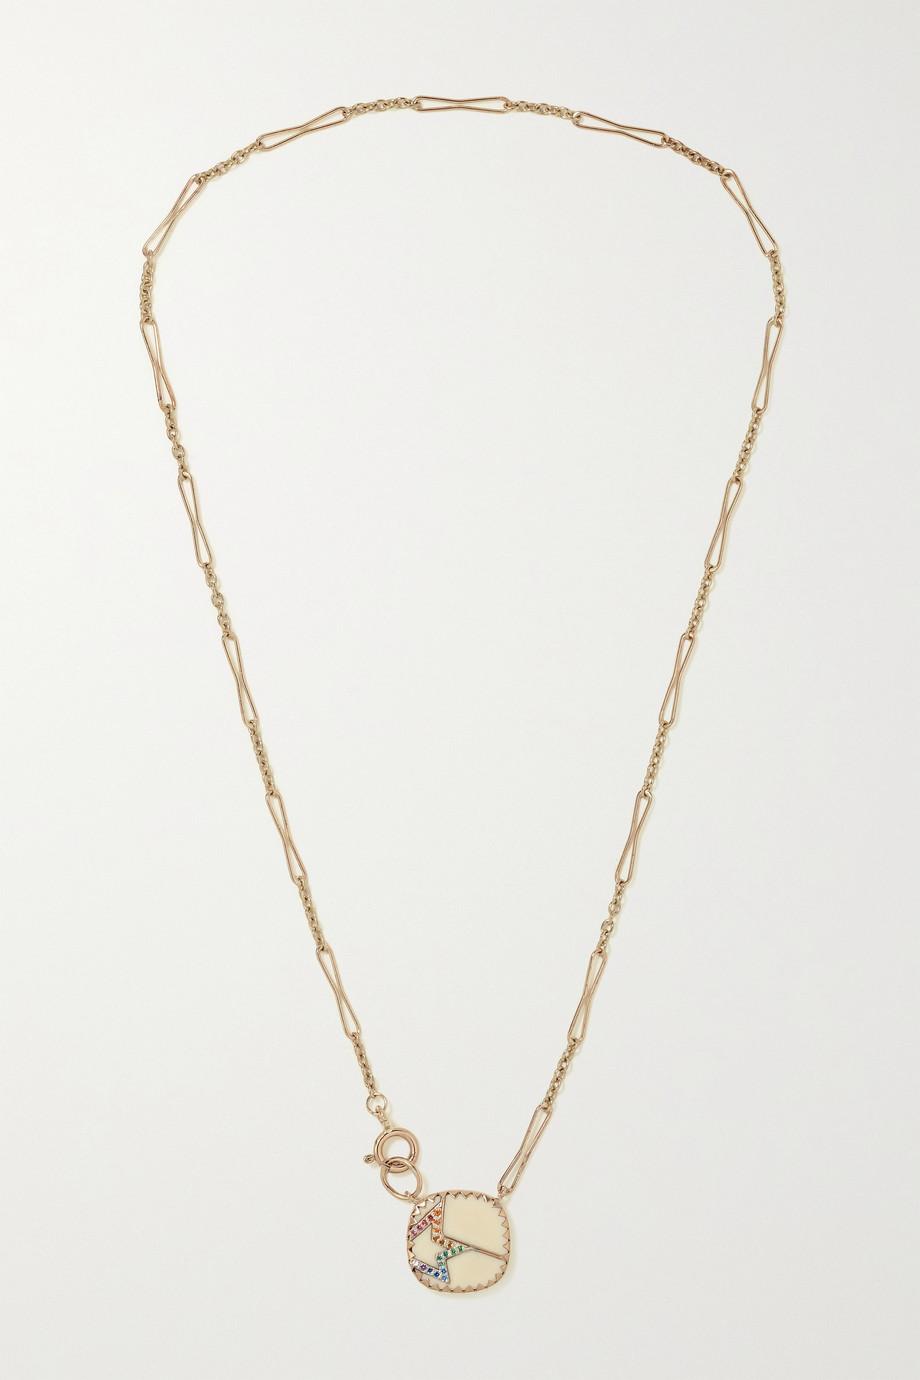 Pascale Monvoisin Varda N°2 Kette aus 9 Karat Gold mit Sterlingsilber, Bakelit® und Nanogem